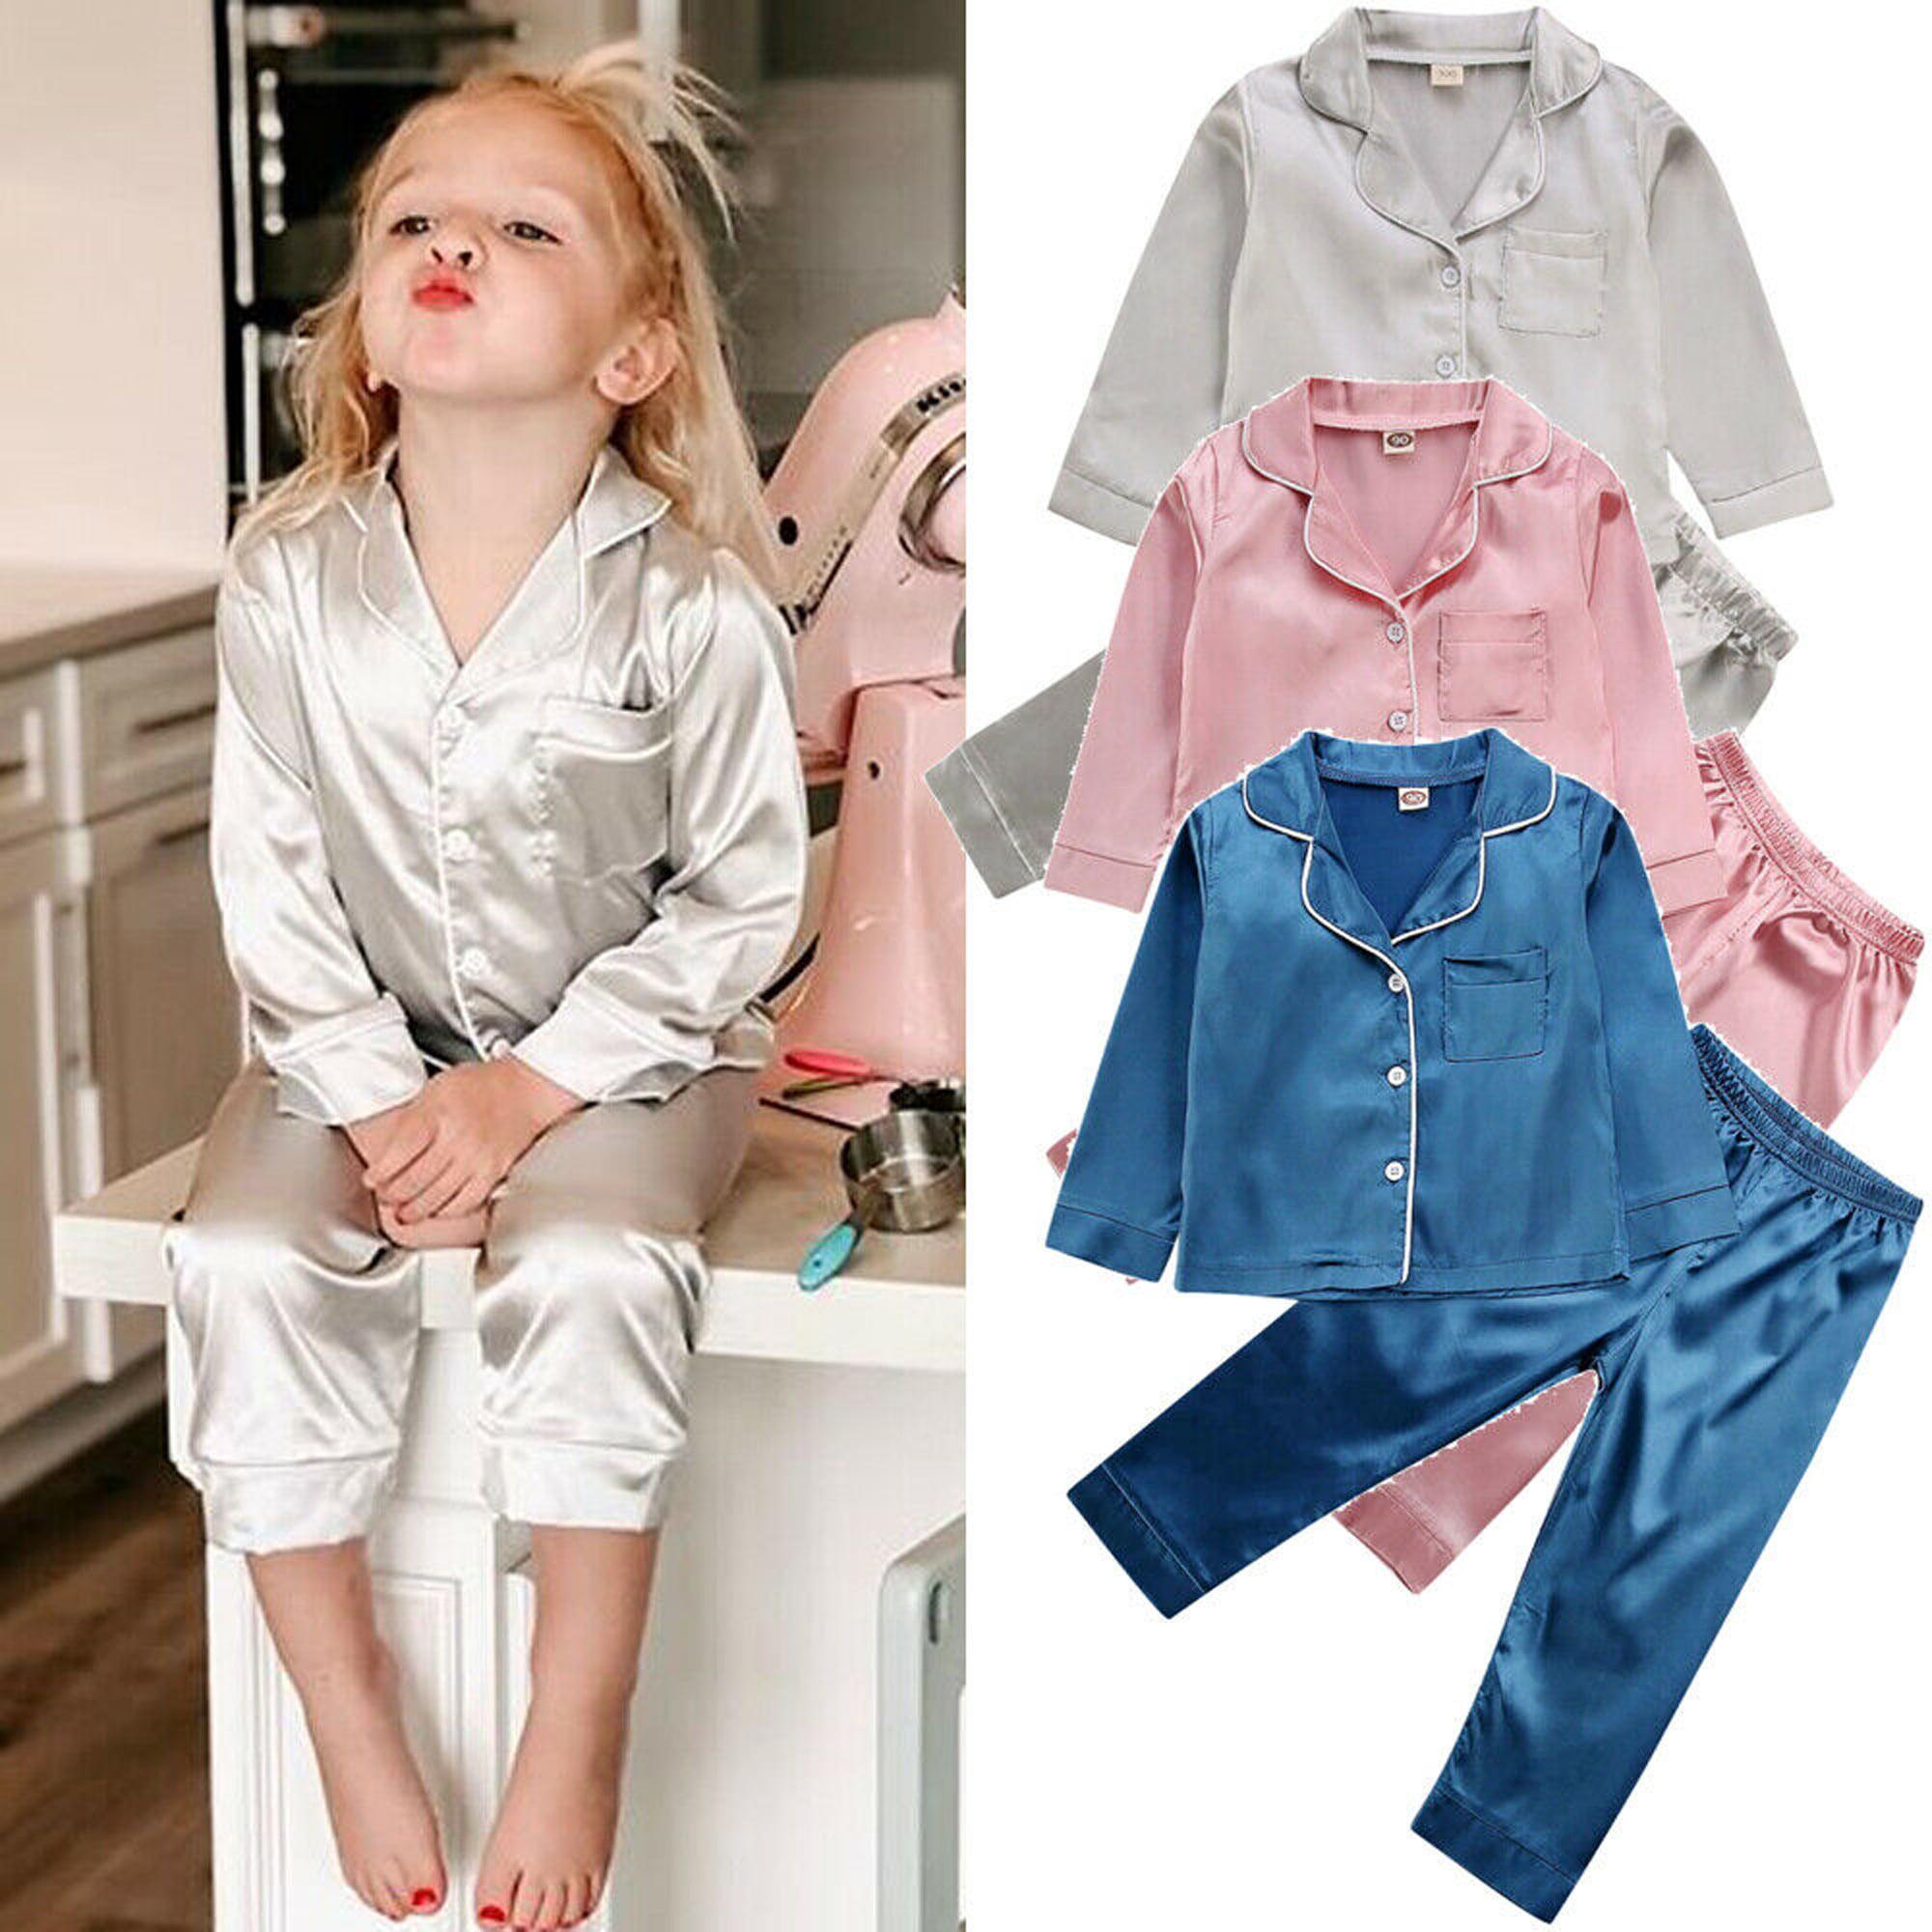 Toddler Kids Pajamas Girls And Boys Silk Sleep Wear Nightwear Soft Cotton Outfit